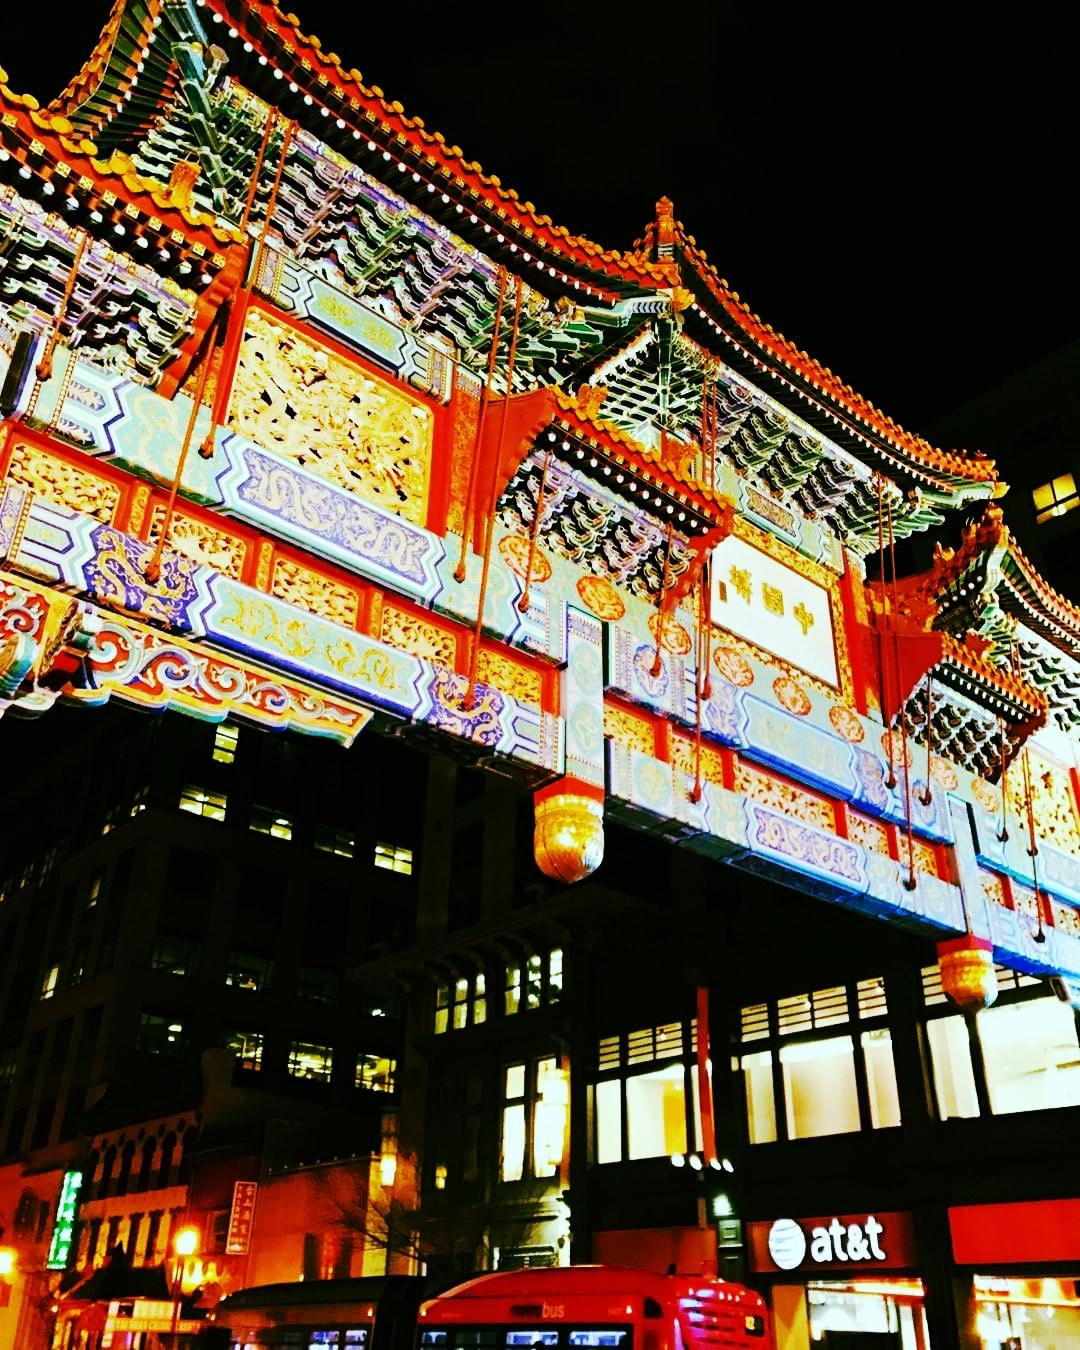 Chinatown Archway, DC